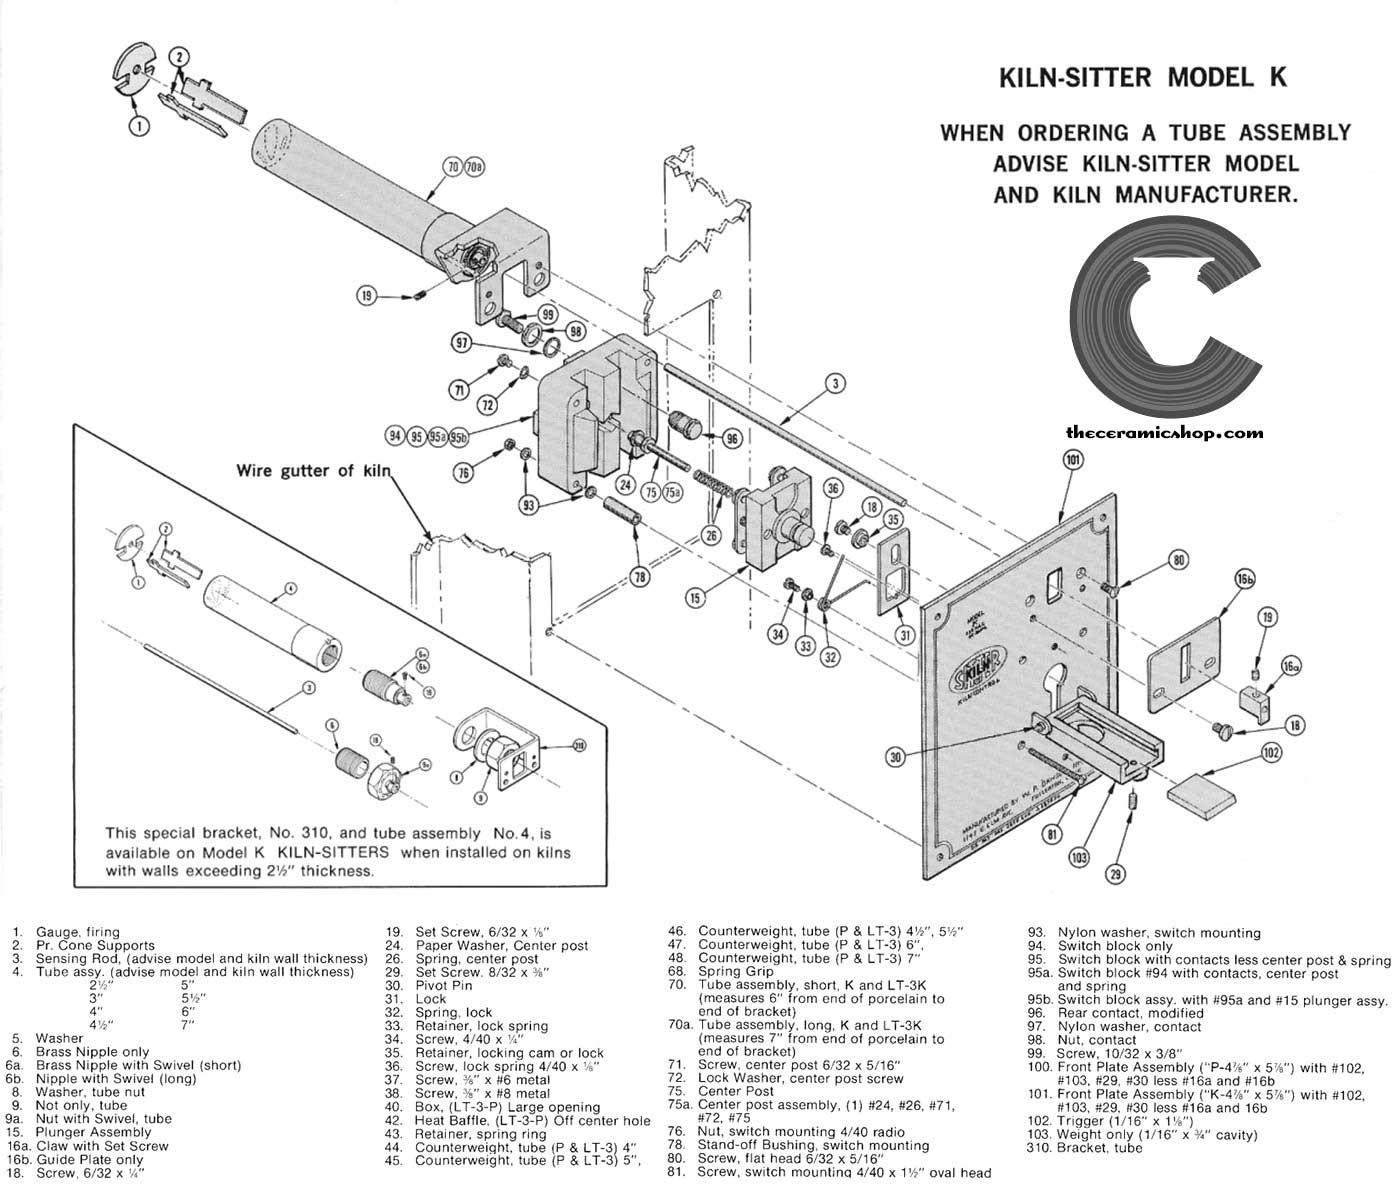 duncan kiln wiring diagram 97 grand marquis fuse sitter parts the ceramic shop part replacement list